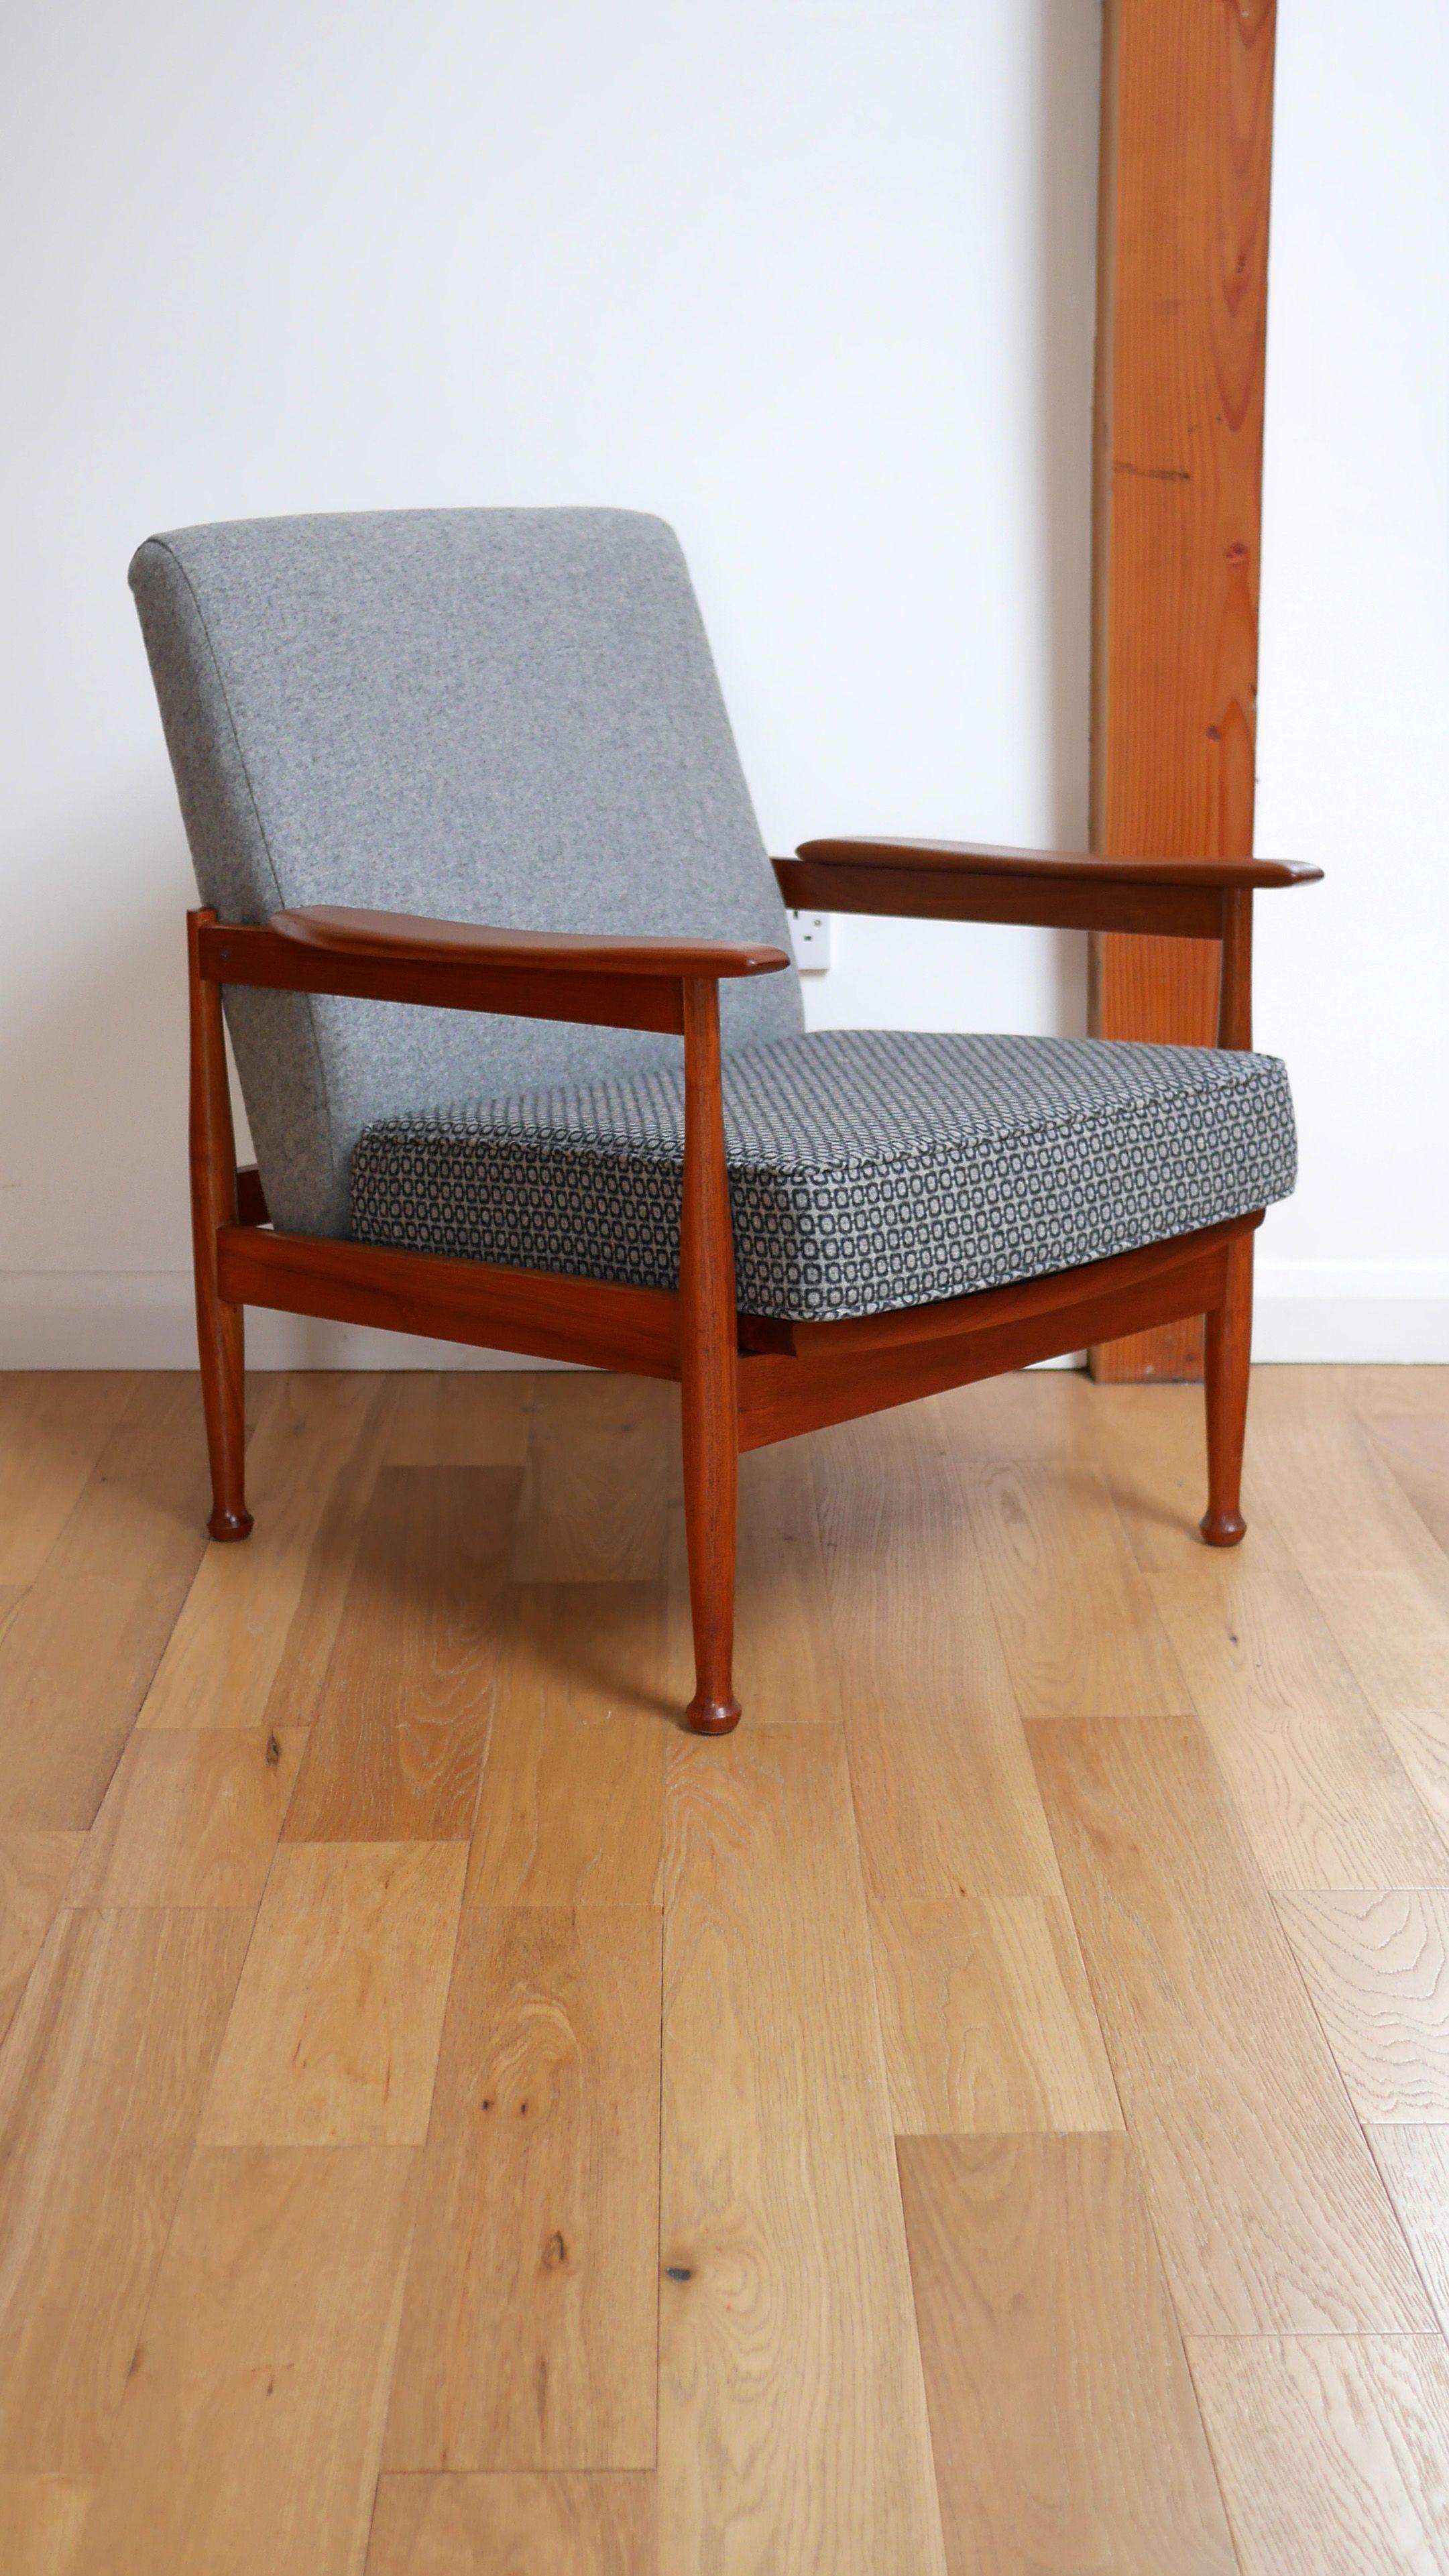 Pleasant Guy Rogers Manhattan Teak Reclining Armchair C 1962 Creativecarmelina Interior Chair Design Creativecarmelinacom